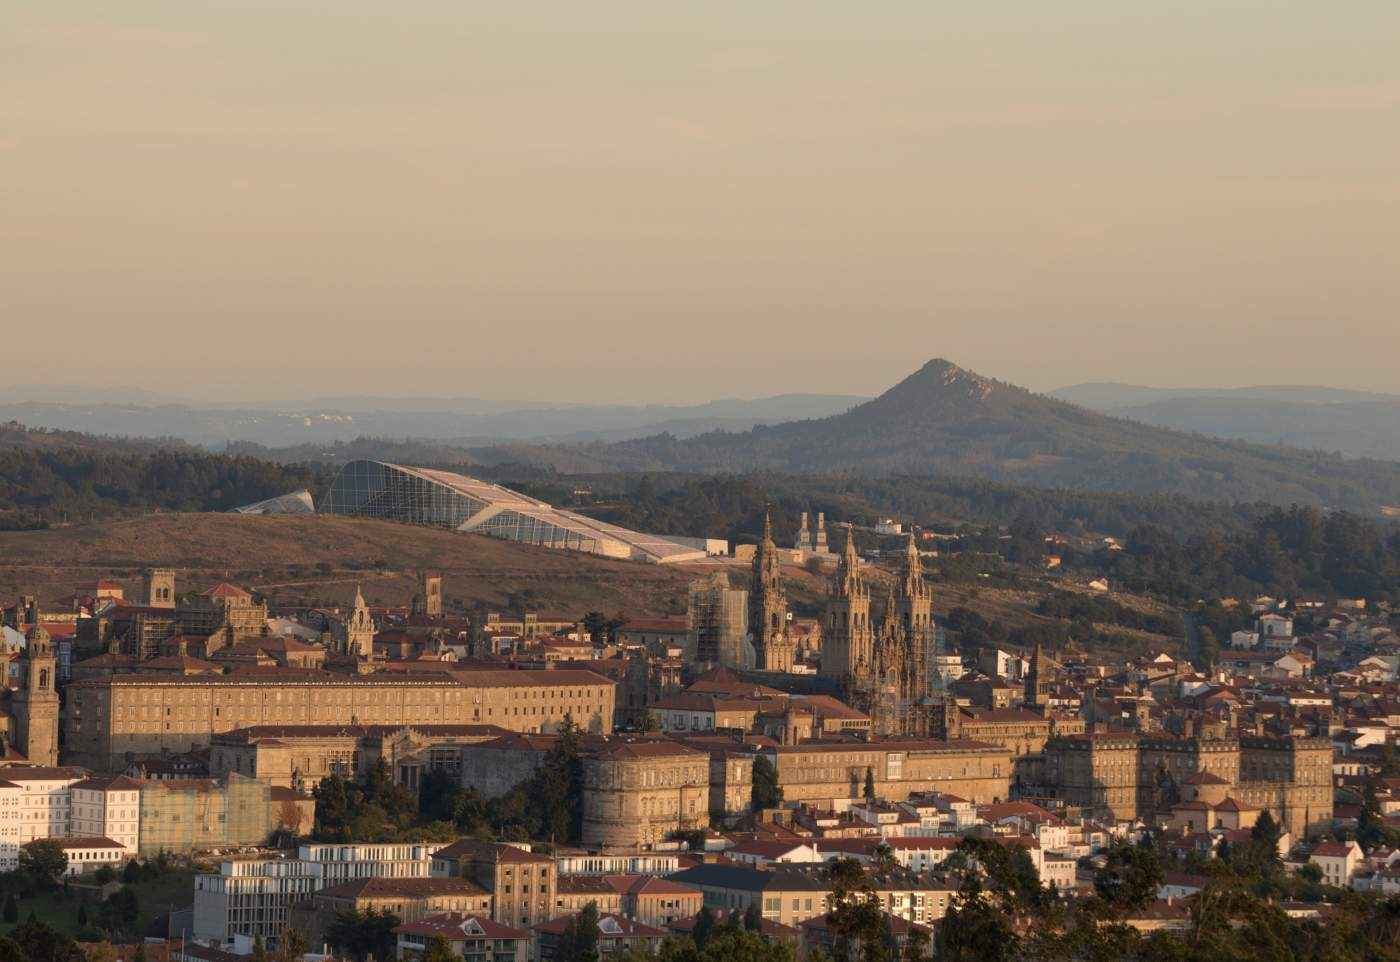 Vista geral de Santiago de compostela